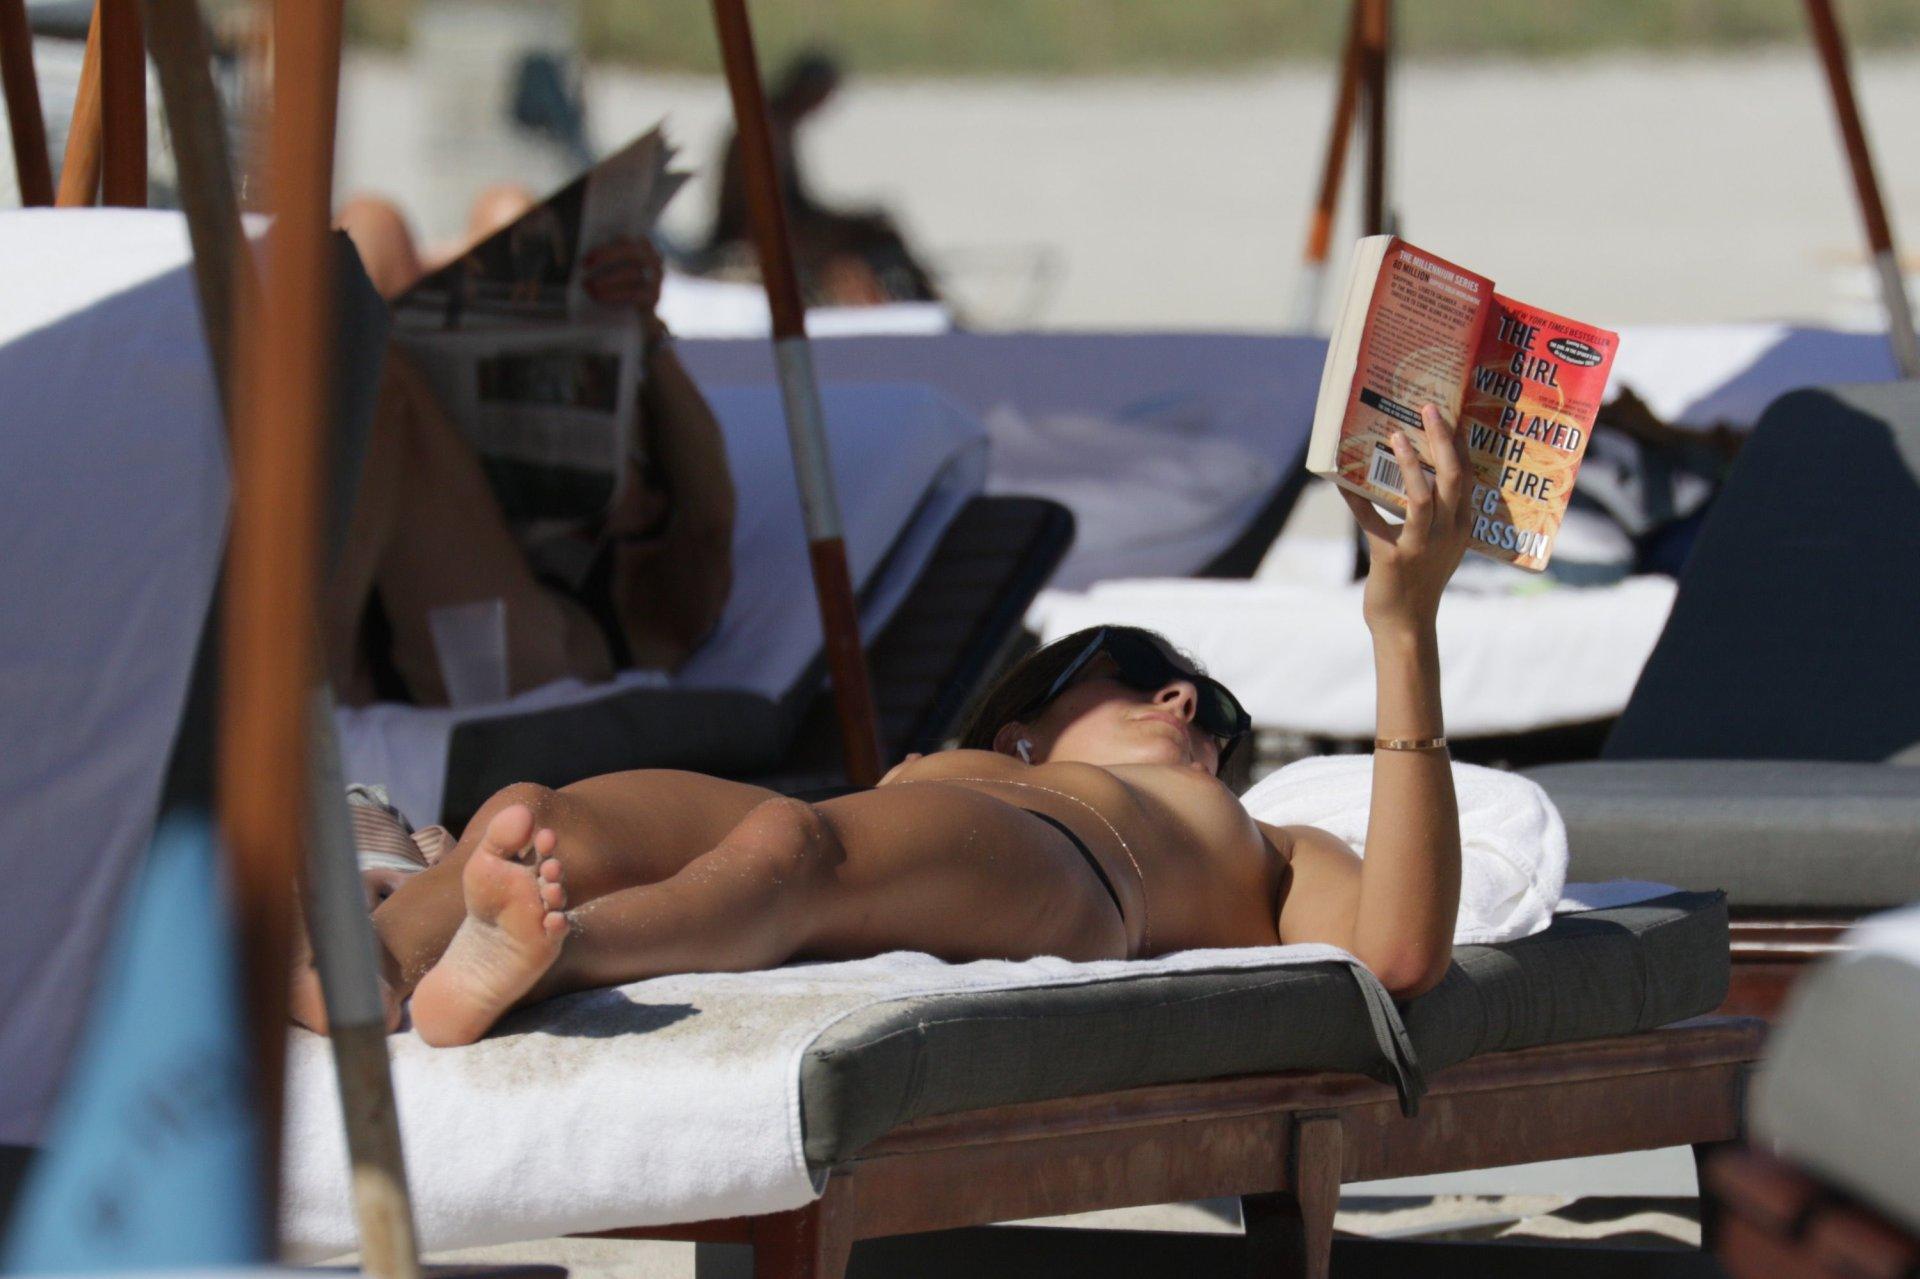 Boobs Lucy Aragon naked (32 photos), Topless, Bikini, Instagram, legs 2020